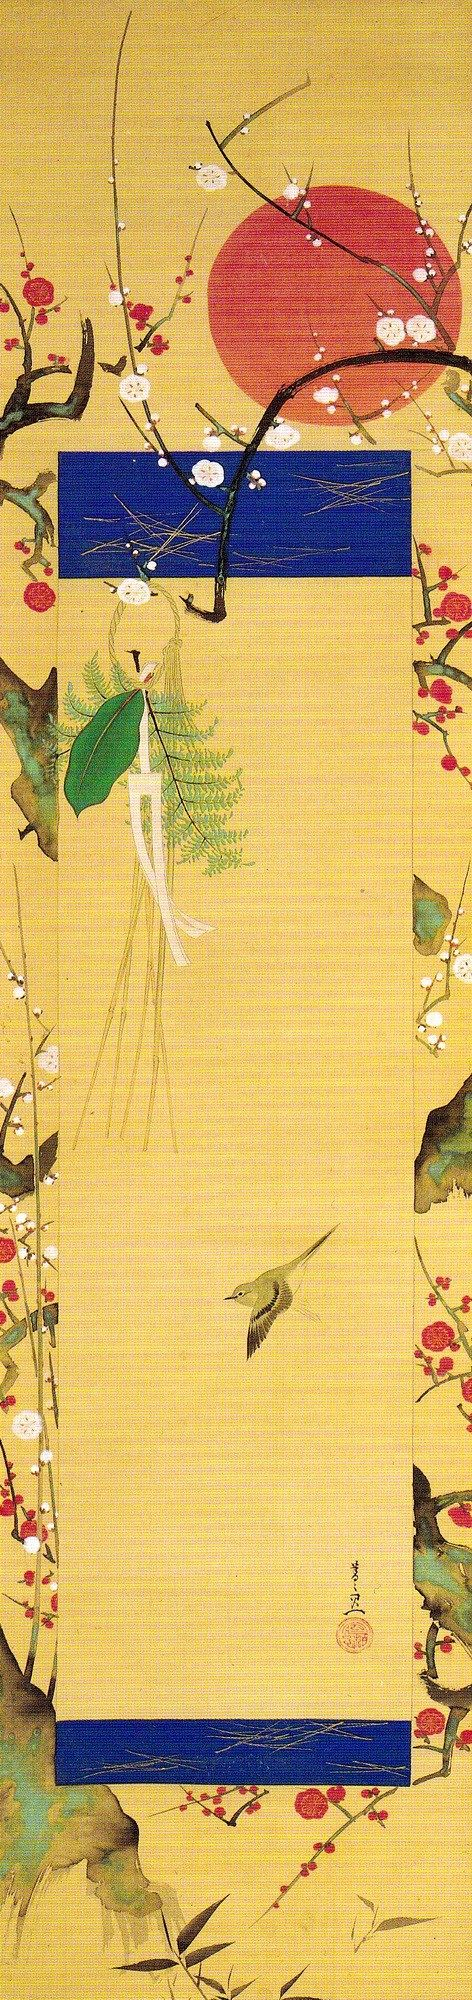 Title:歳首の図 Artist:鈴木其一 Suzuki Kiitsu